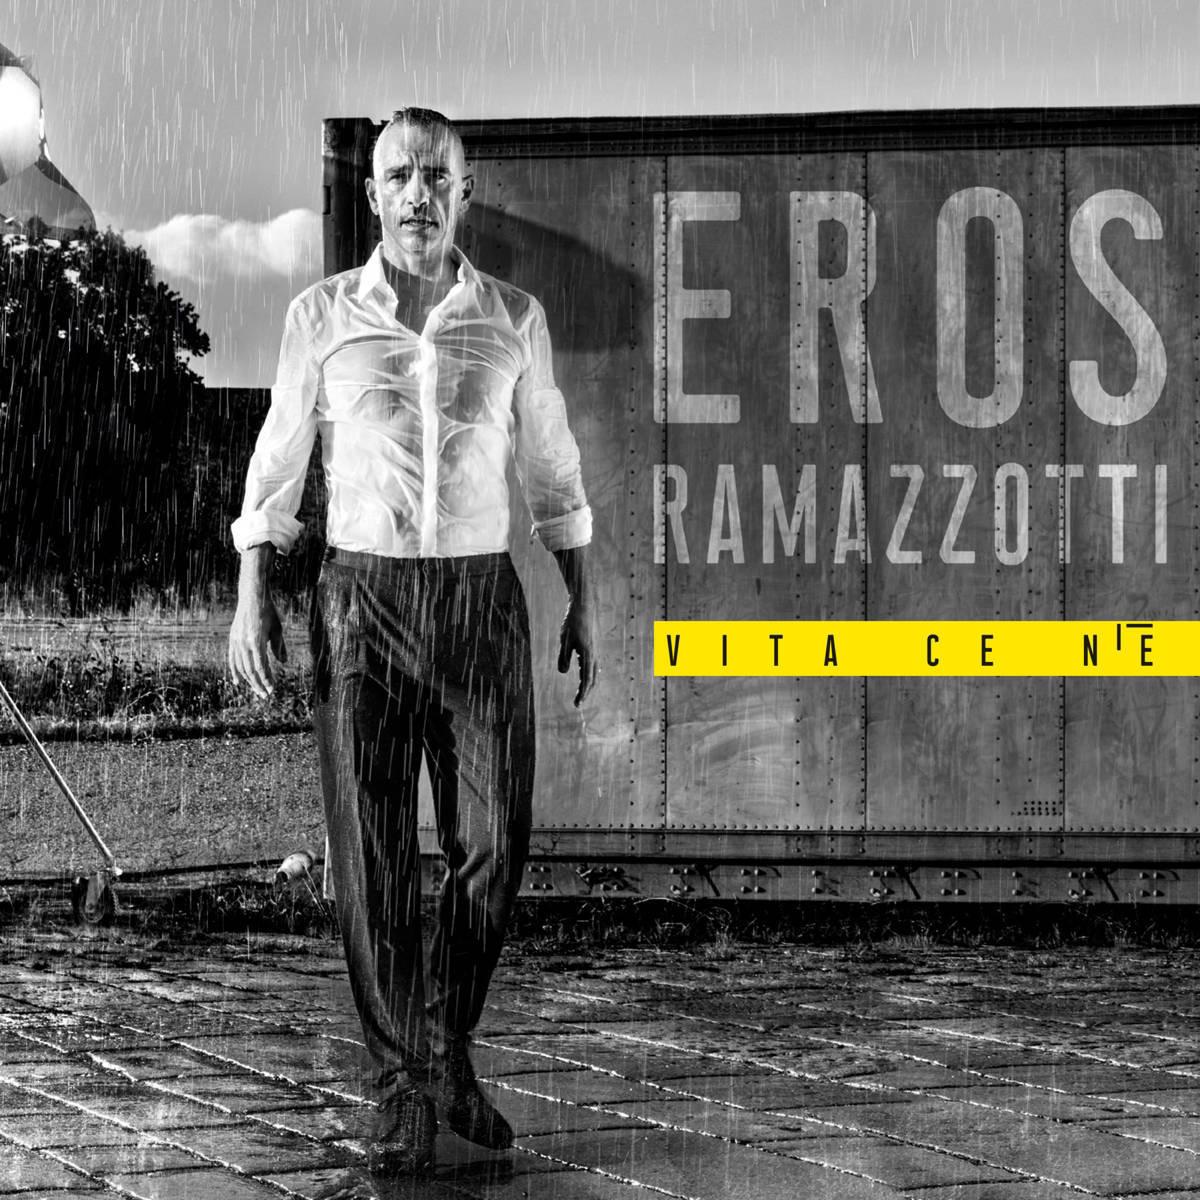 Eros Ramazzotti - Vita Ce N'e (CD)